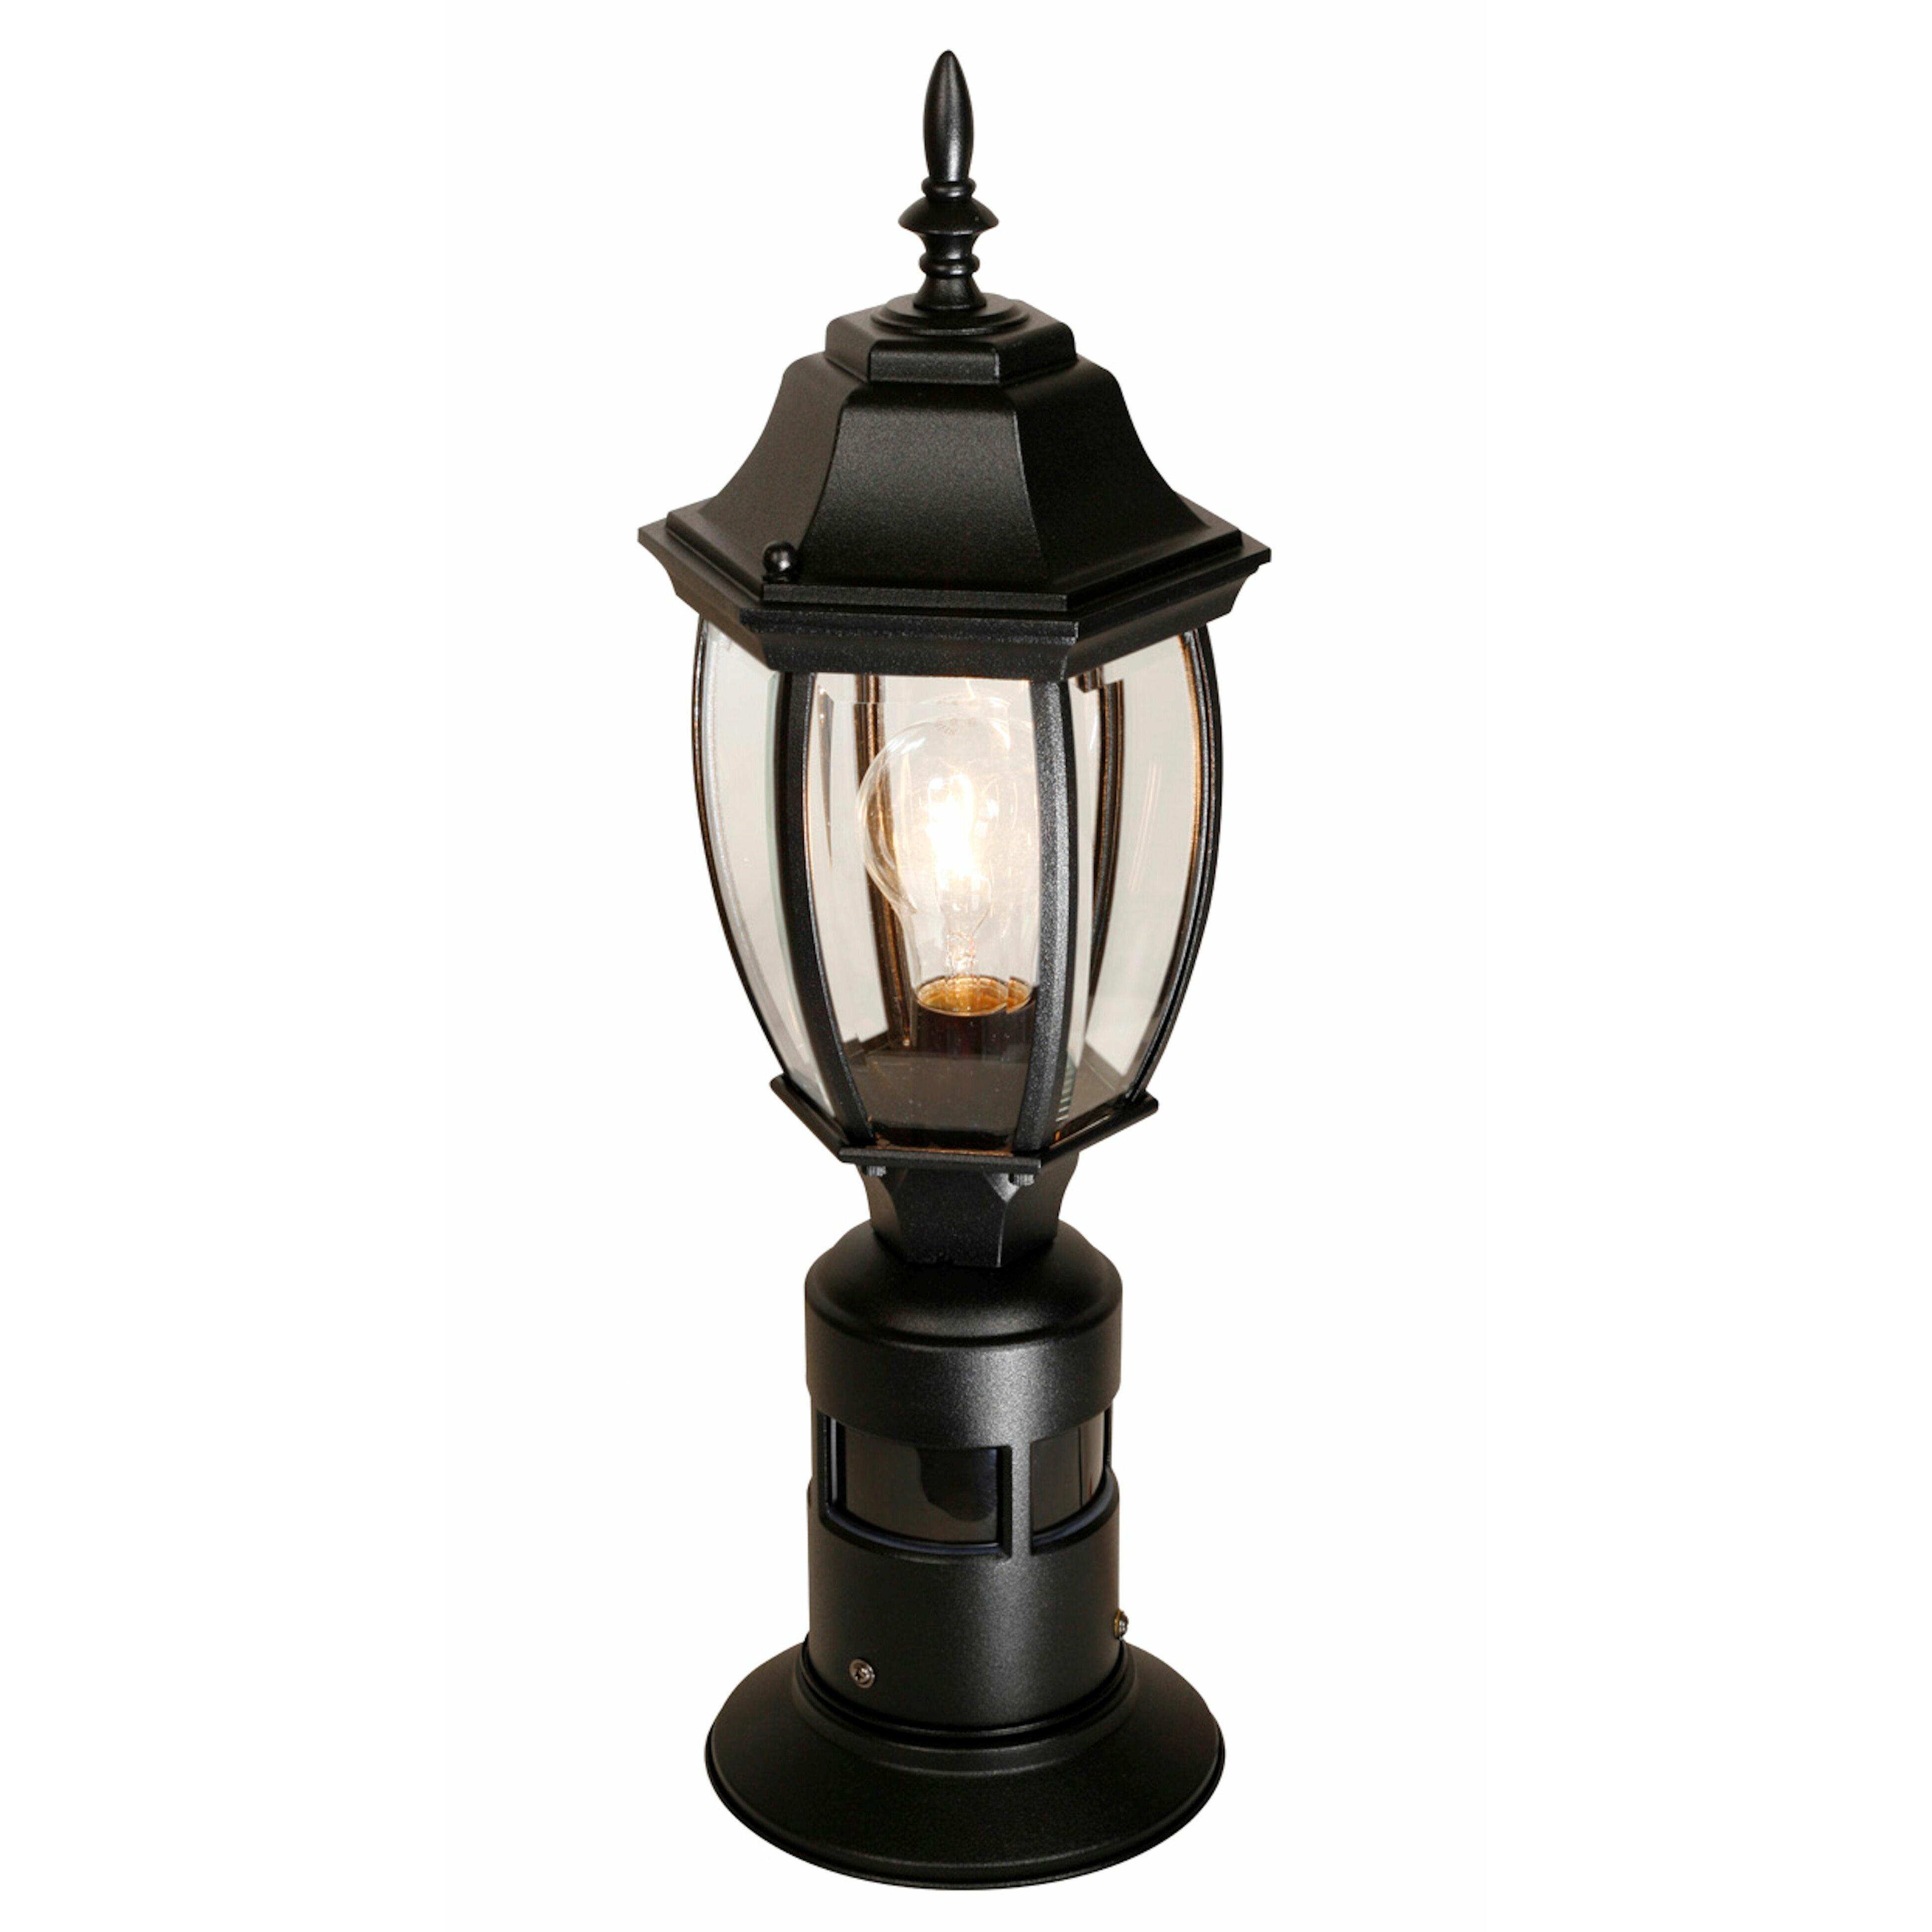 "Heath Zenith 1 Light 7"" Outdoor Post Lantern with Motion"